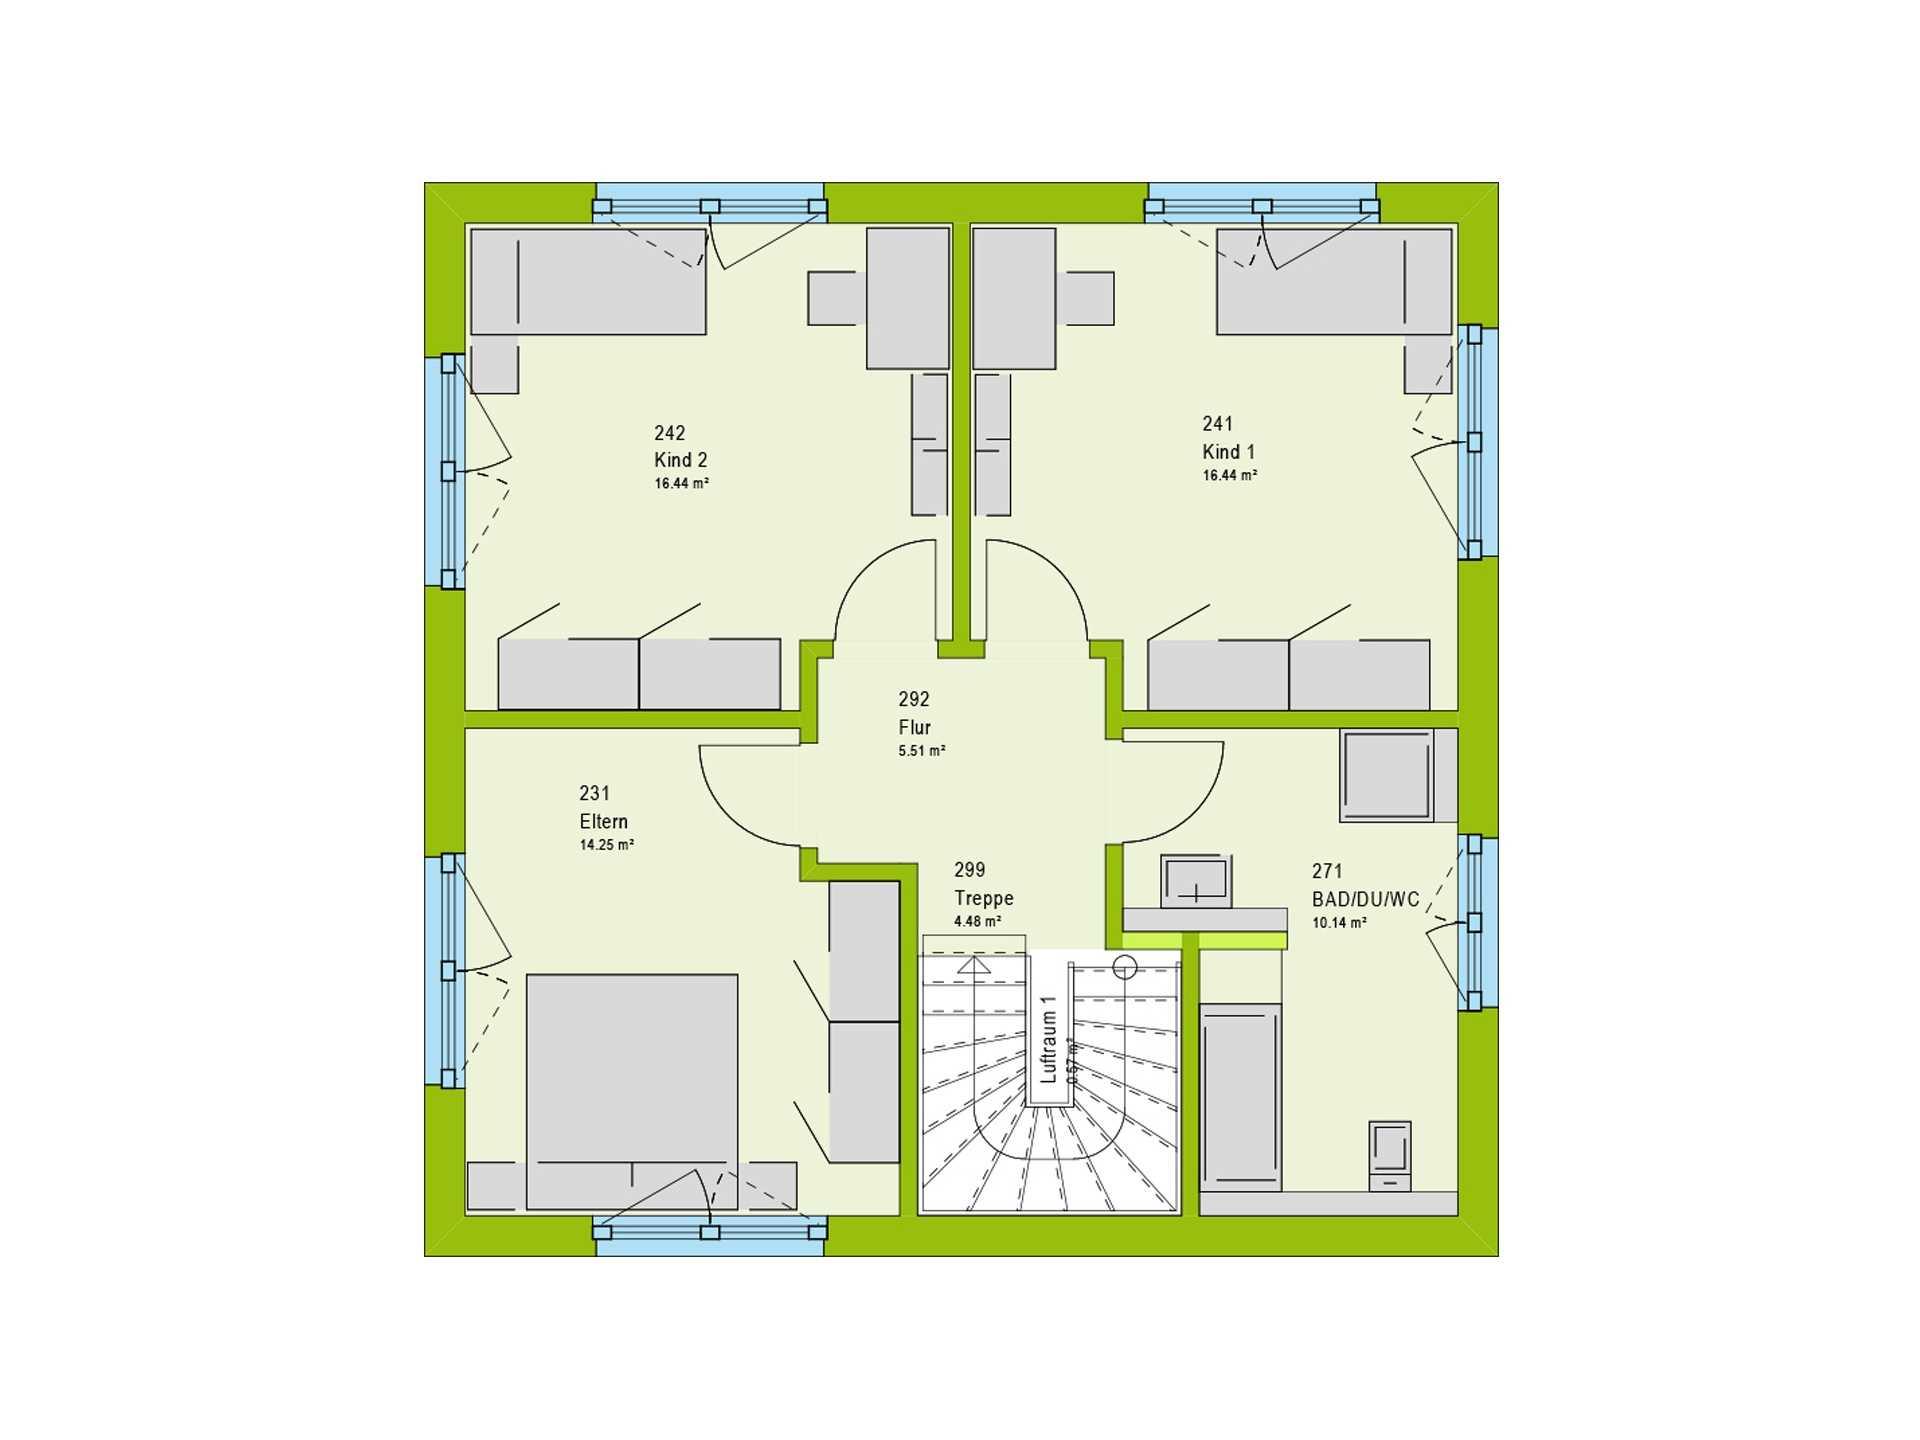 Kubus haus bauhausstil beispielh user anbieter in for Bauhaus einfamilienhaus grundriss